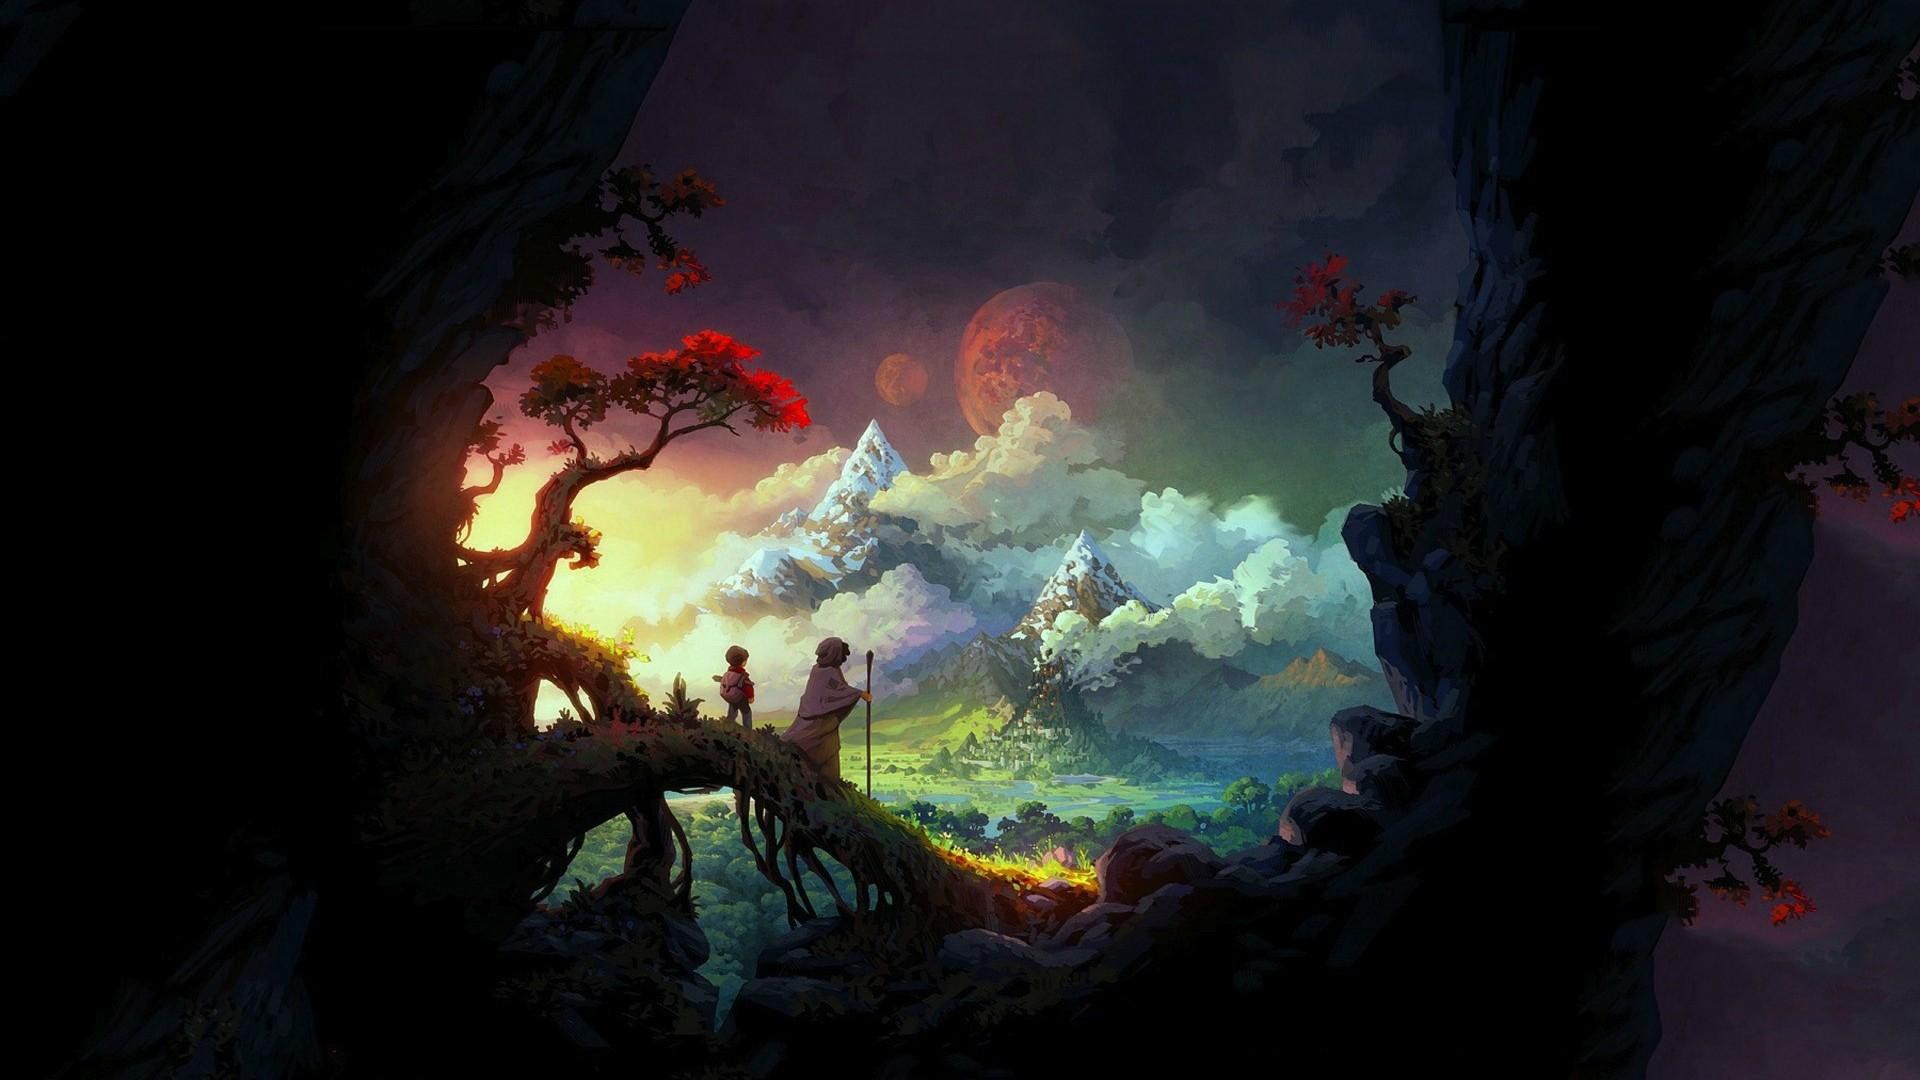 The Wormworld Saga Hd Wallpaper Hd Wallpapers